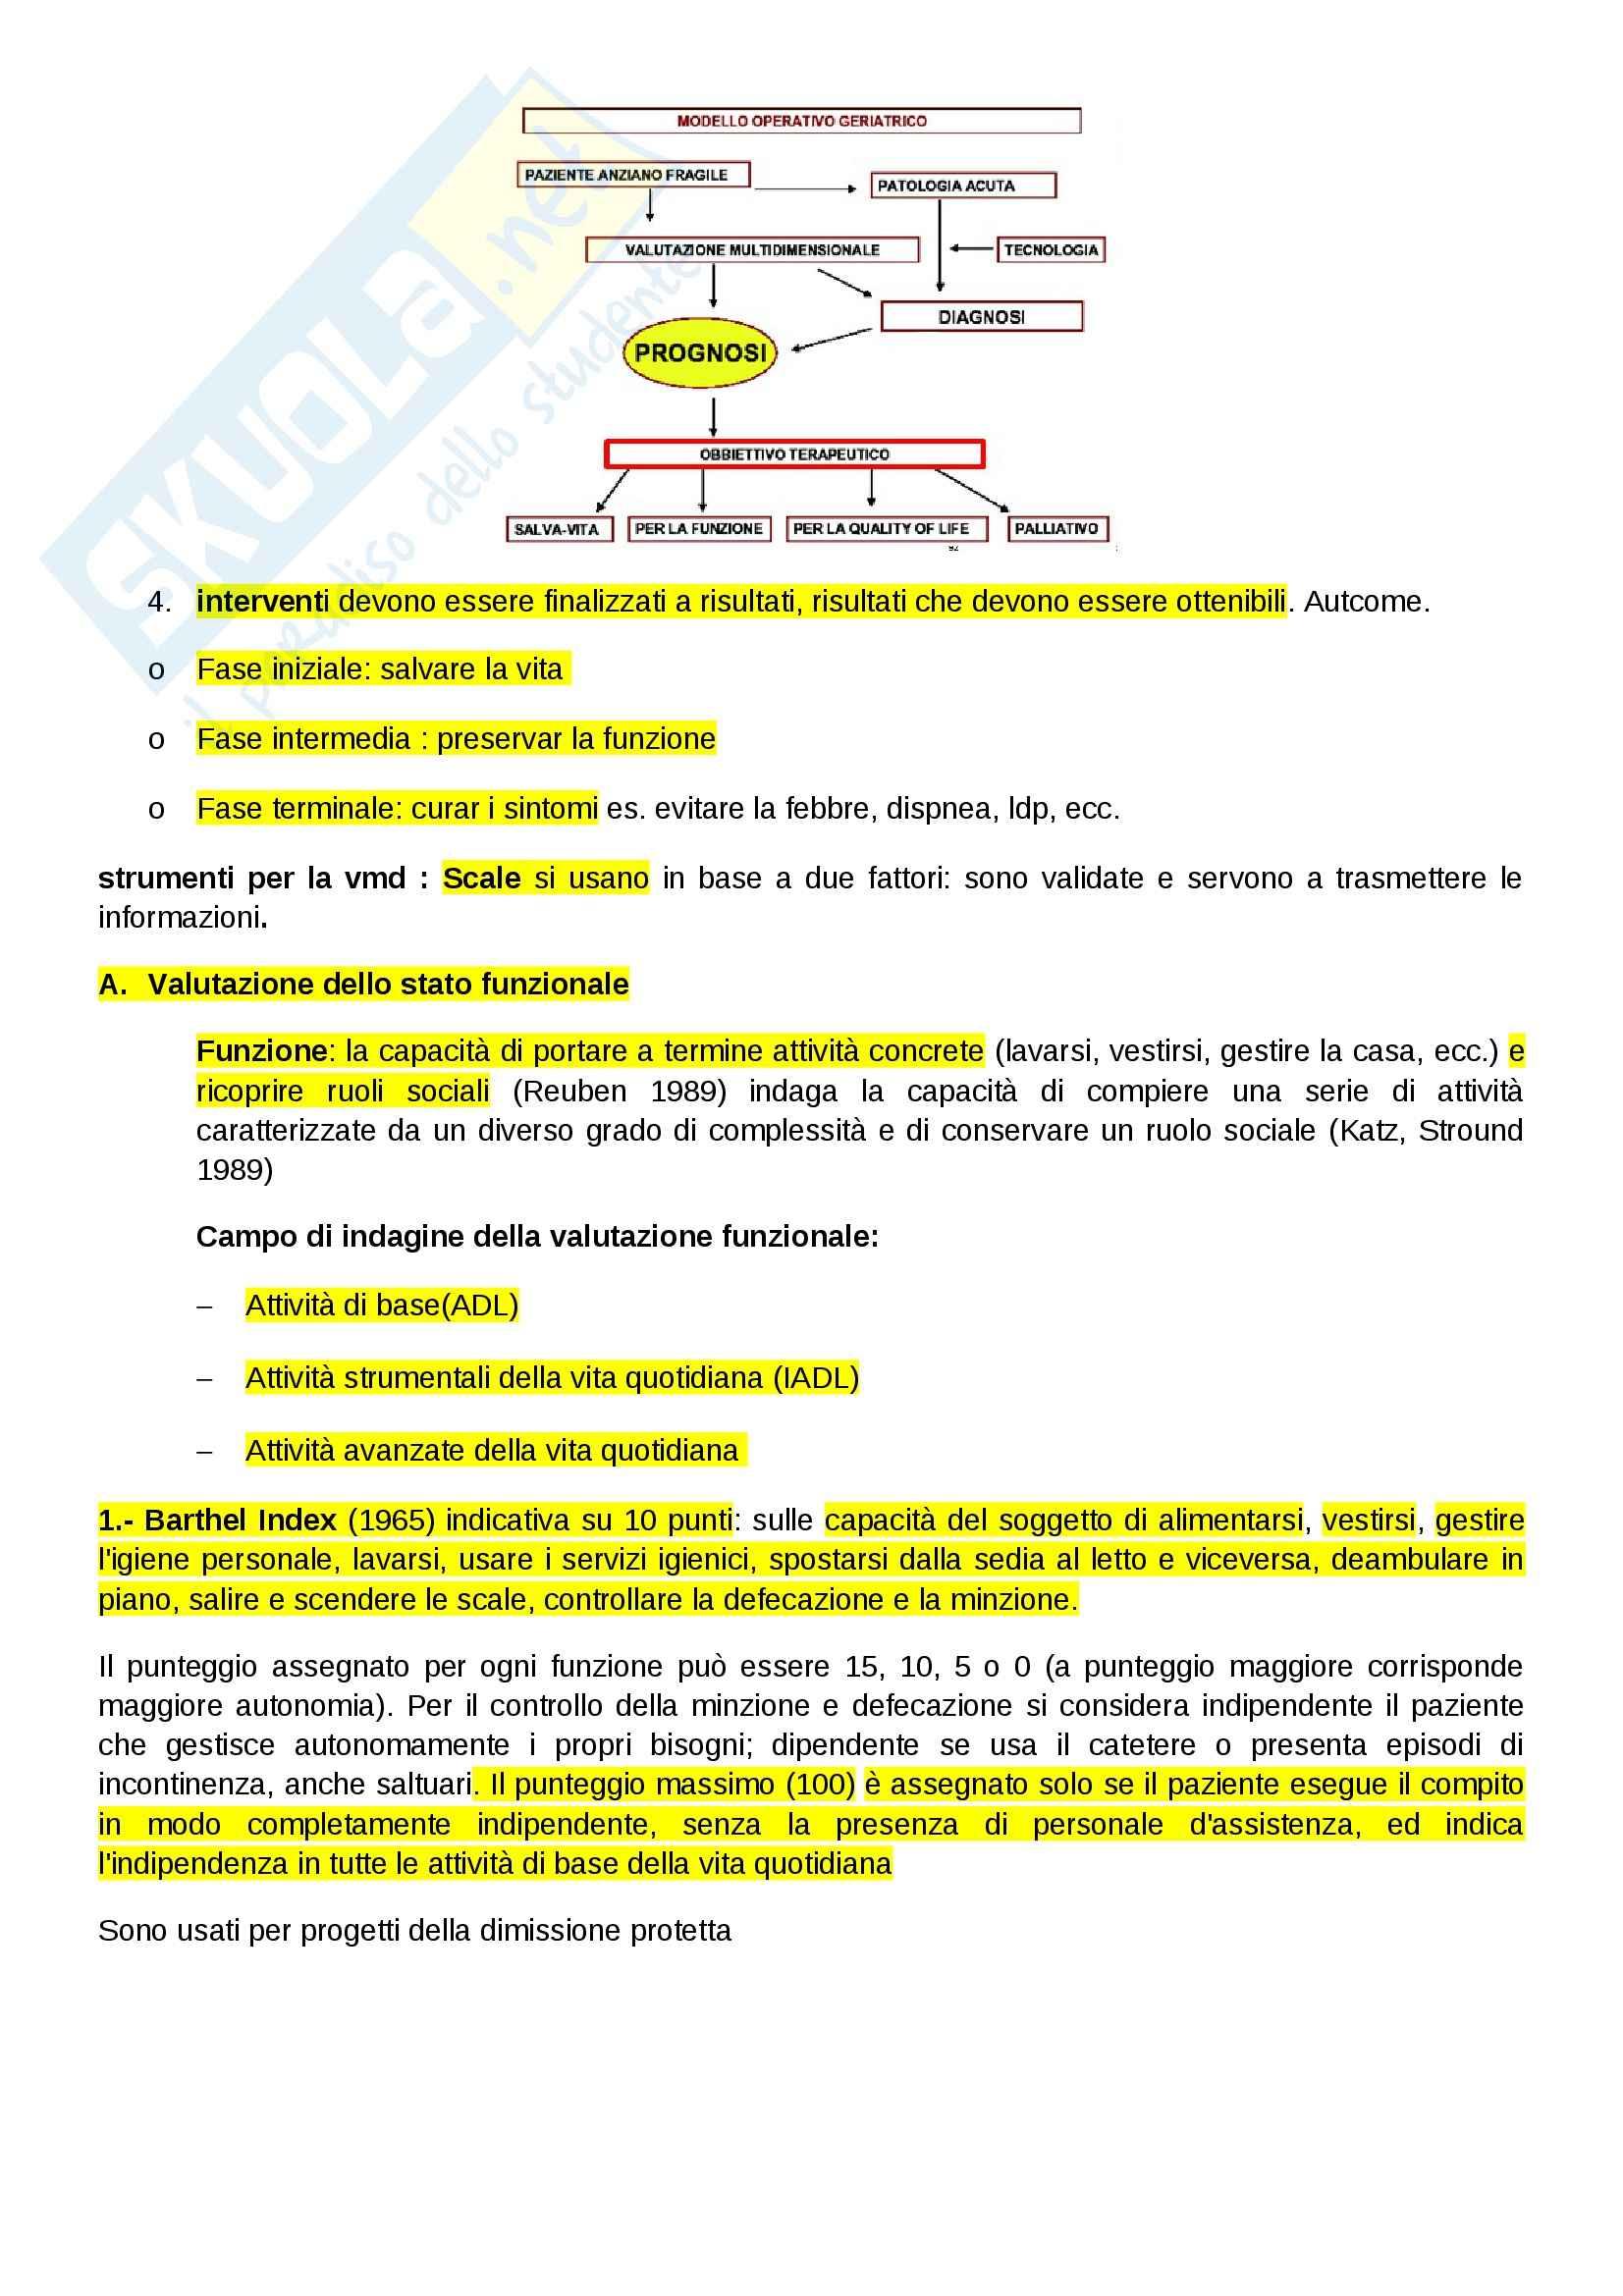 Geriatria - Appunti Pag. 6